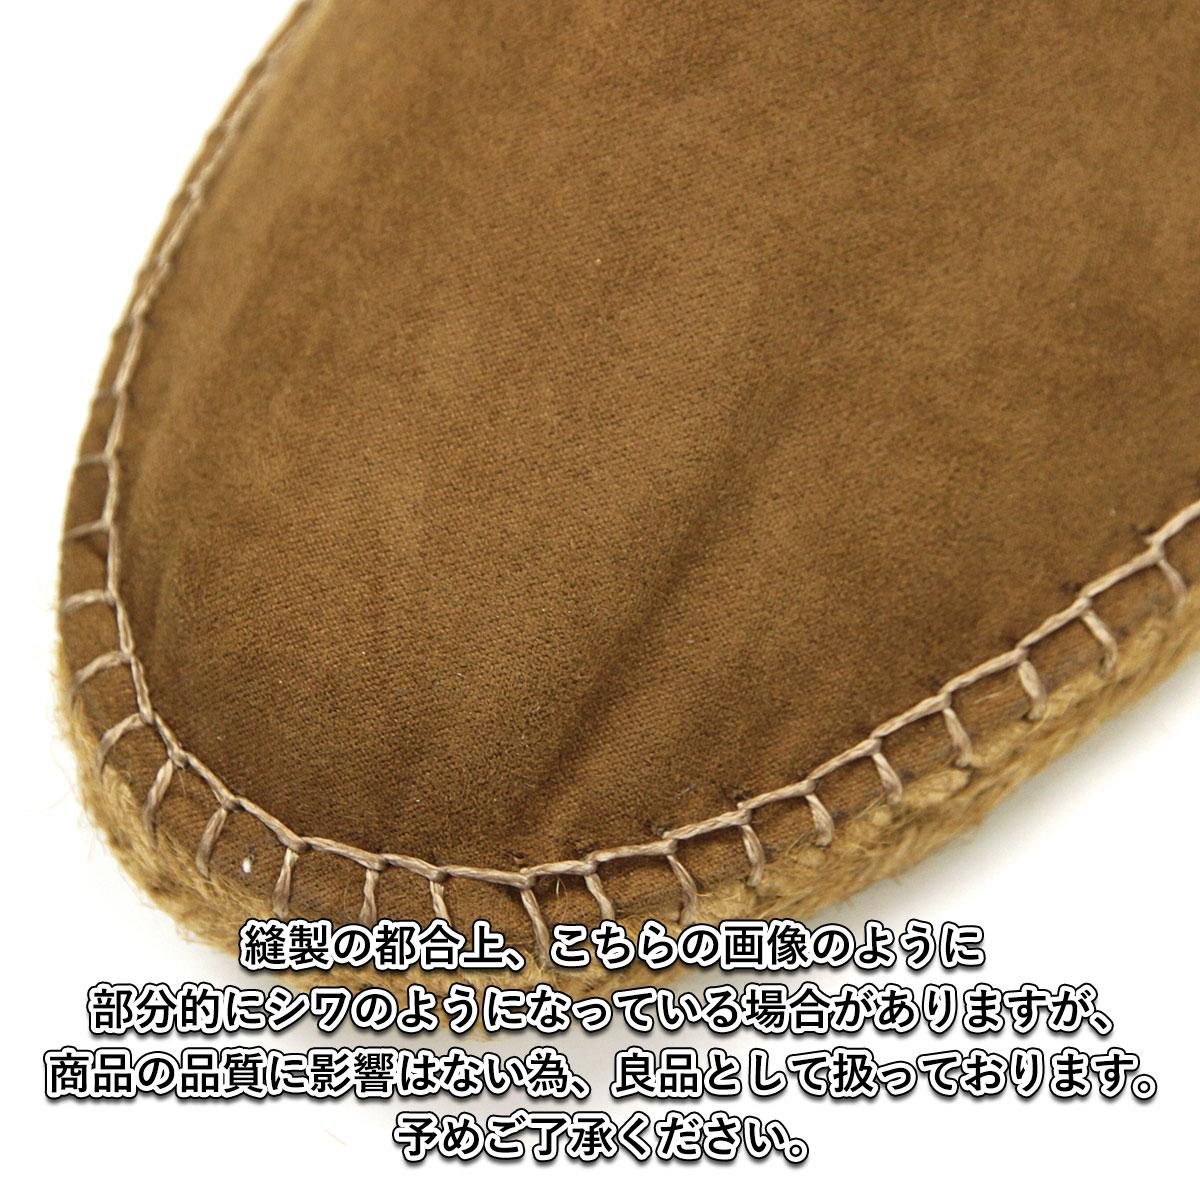 SALVI saruvishuzu正规的店铺麻底帆布鞋ESPADRILLE SUEDE PP SHOES麻底帆布鞋反毛皮革鞋44-46PP CHOCO BROWN